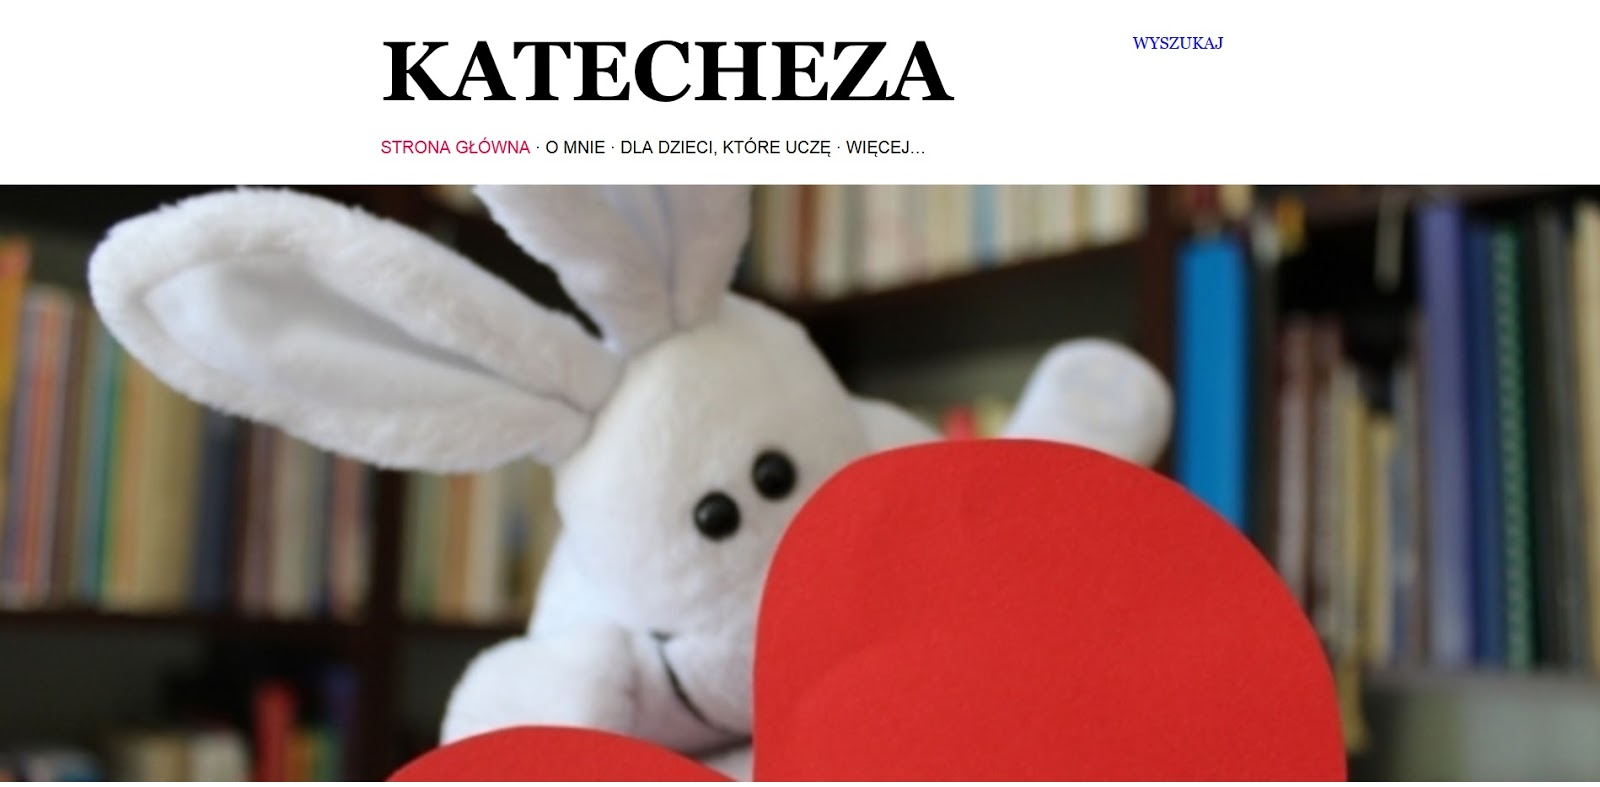 http://ktorganistakatecheza.blogspot.com/